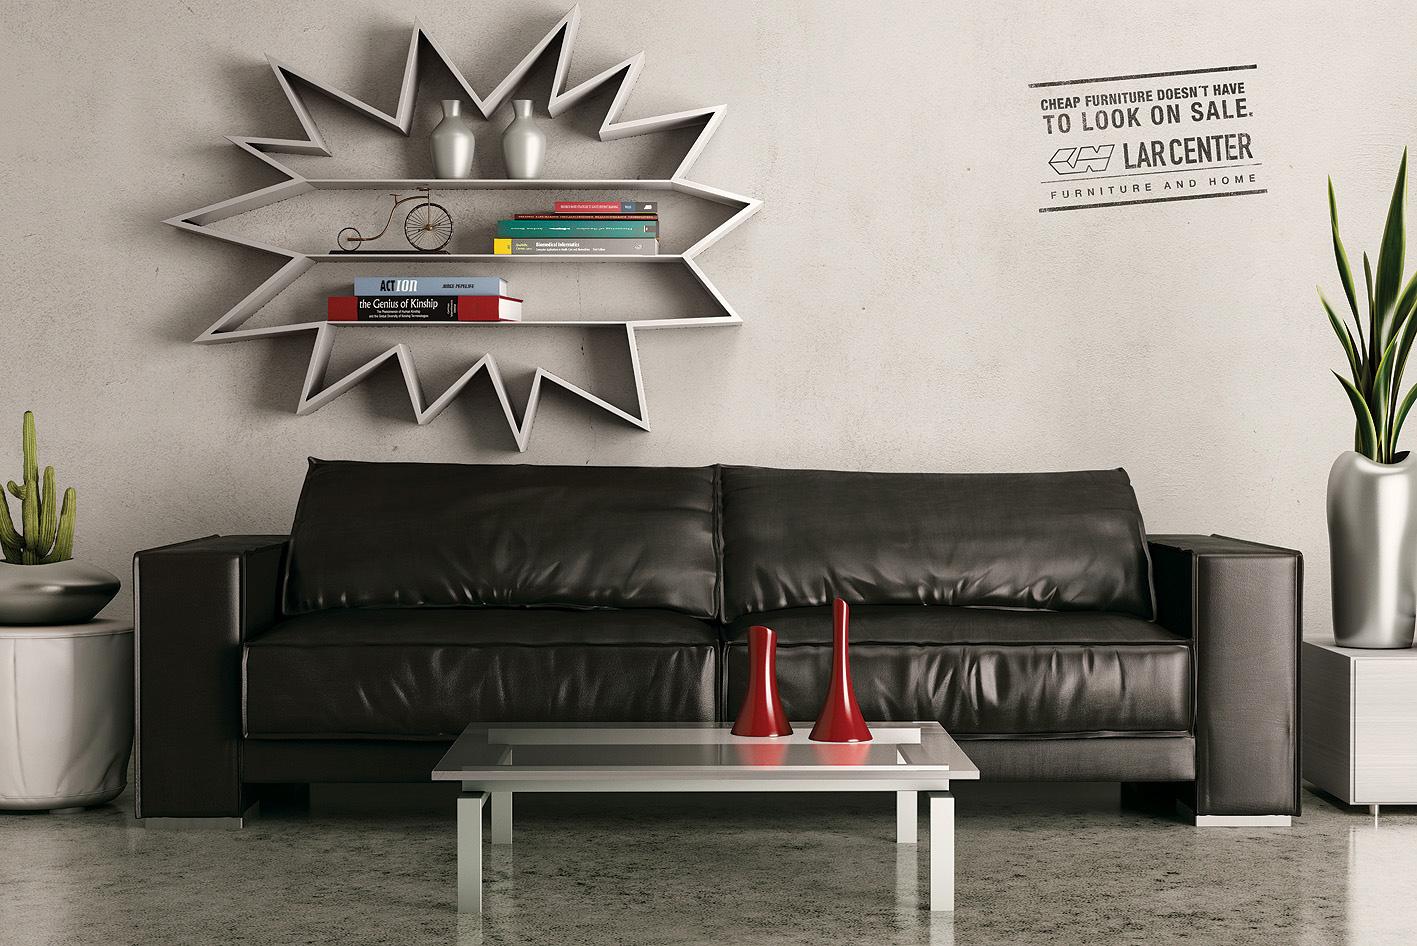 creative images furniture. Lar Center Print Ad - Wall Creative Images Furniture